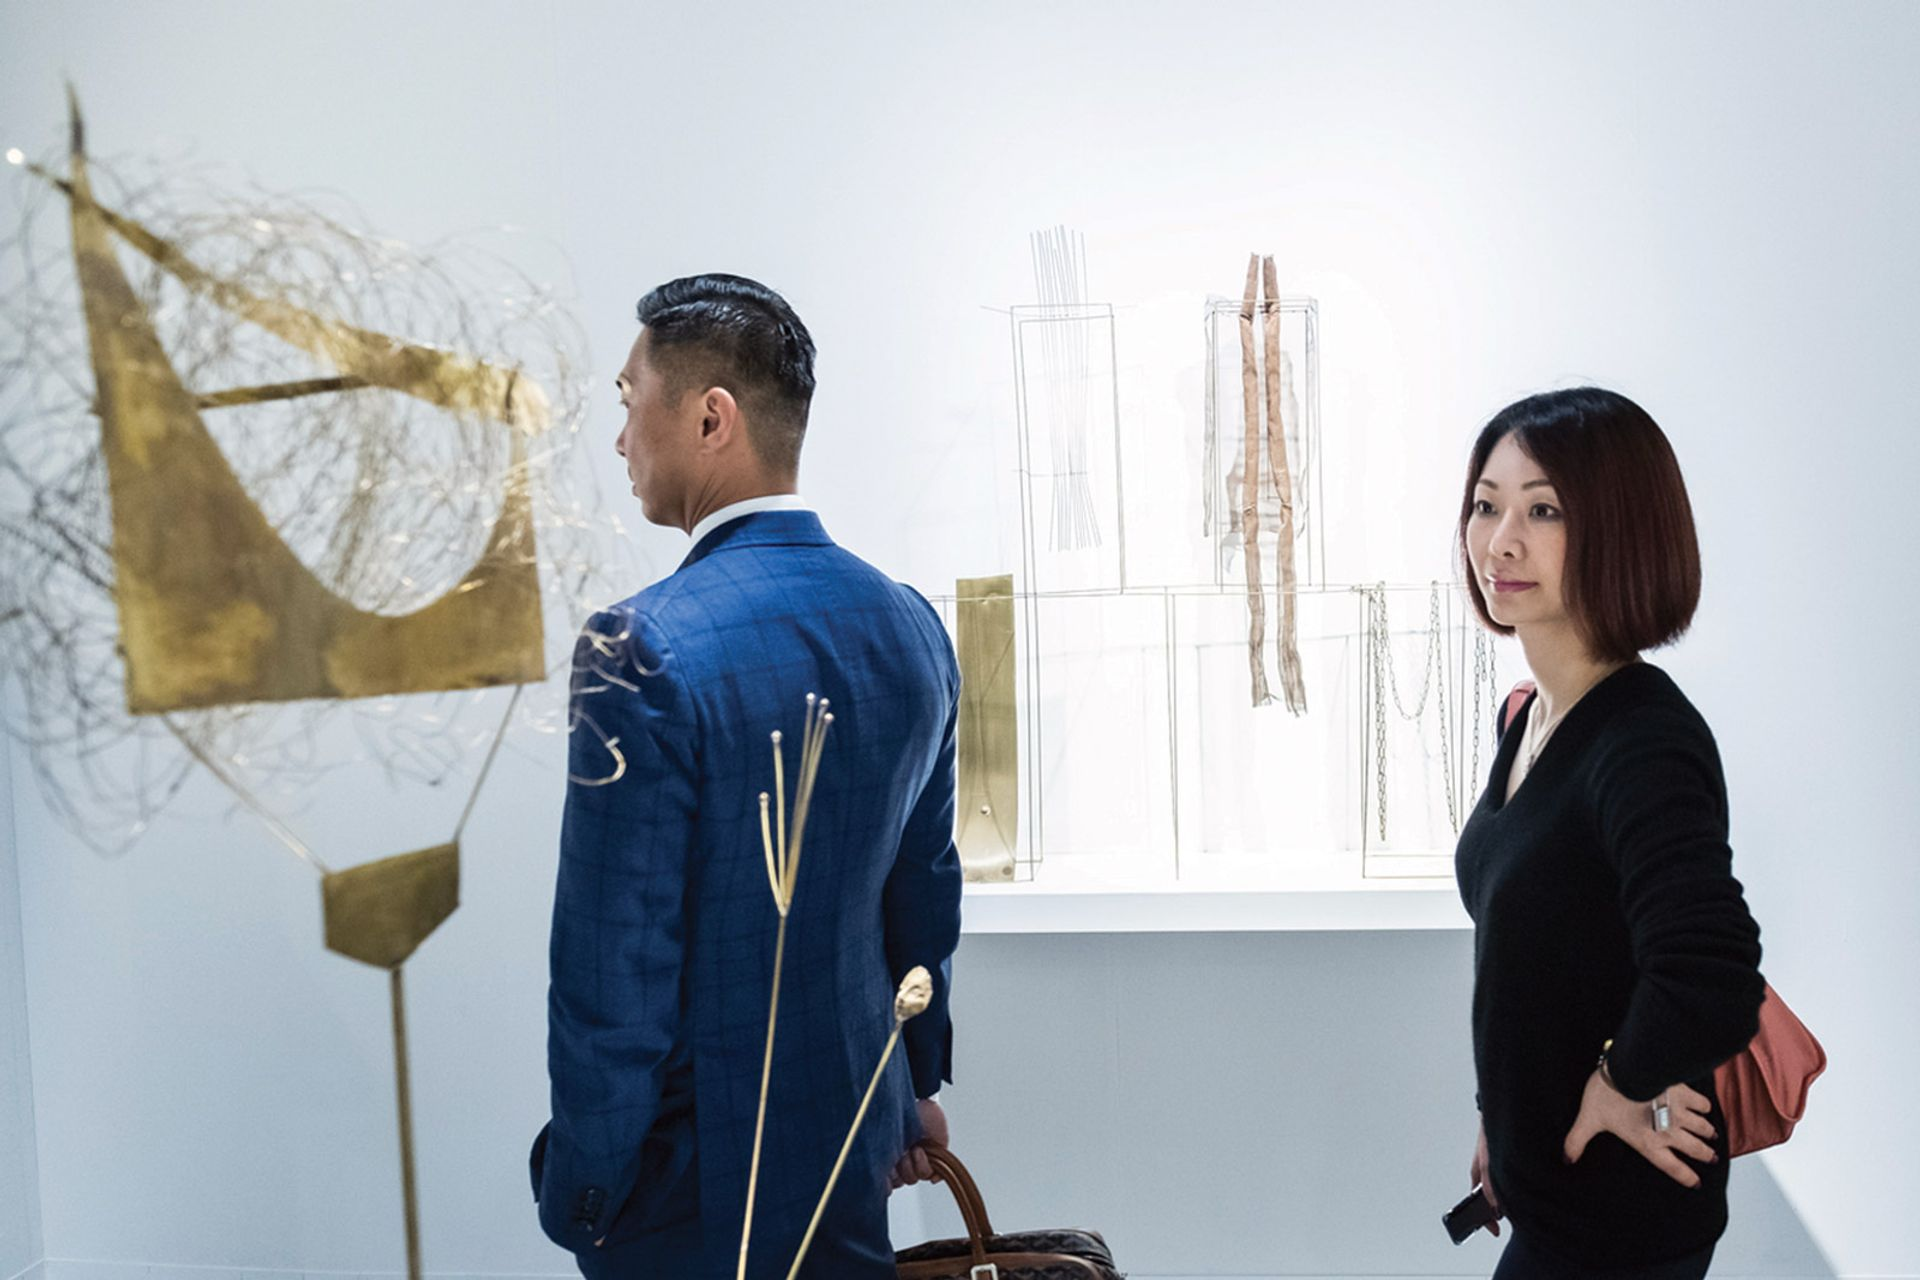 Art Basel in Hong Kong will open in the Hong Kong Convention and Exhibition Centre from 21 May Fausto Melotti at Mazzoleni,  Art Basel Hong Kong 2018 © Art Basel